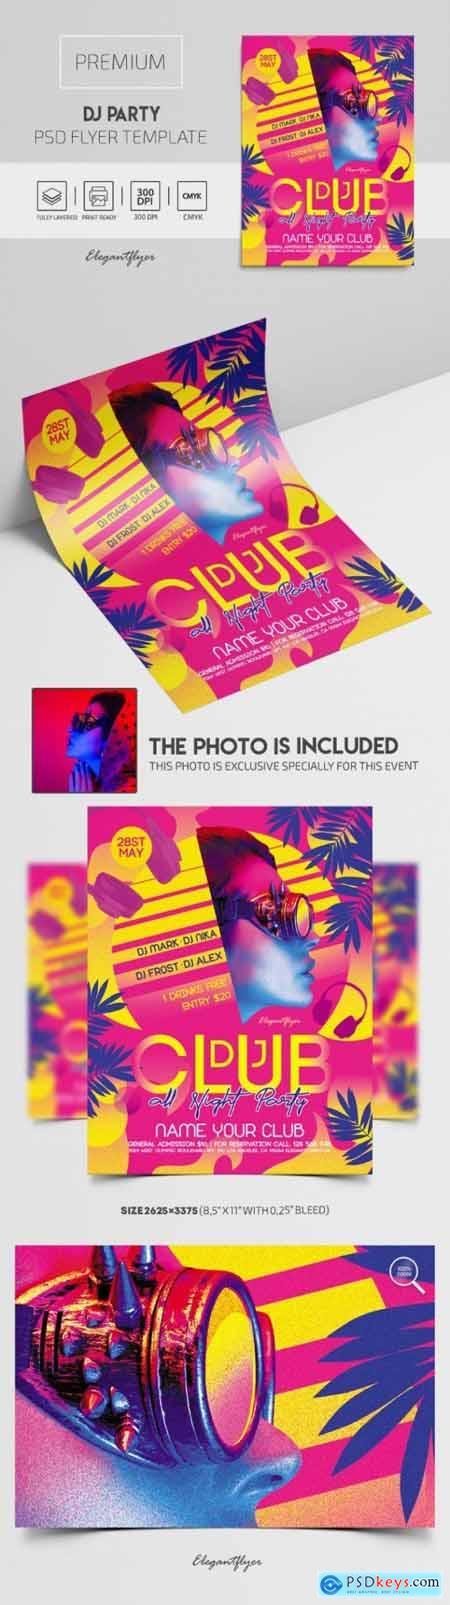 DJ Party – Premium PSD Flyer Template